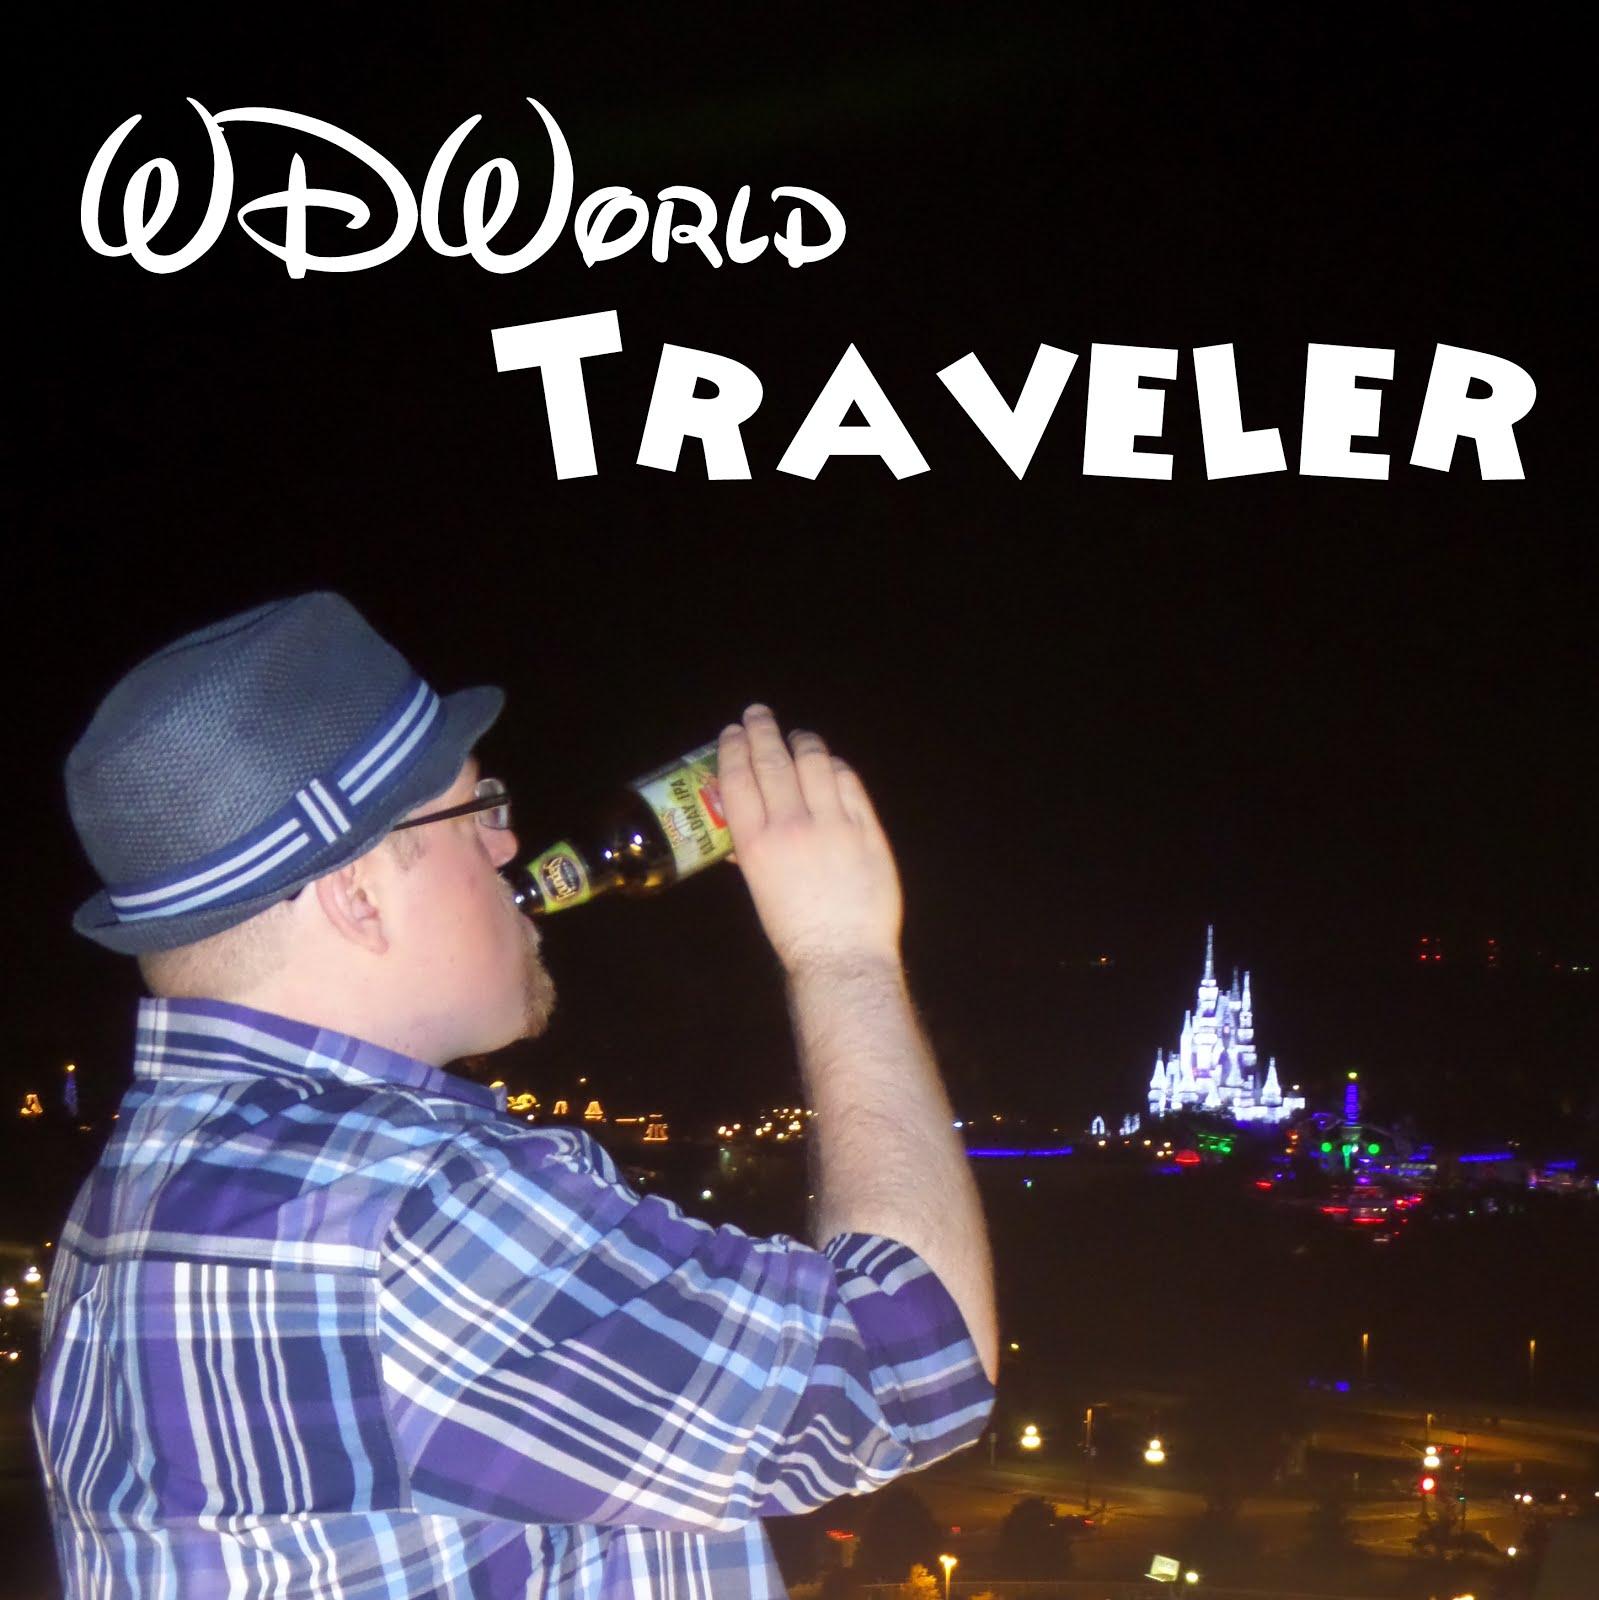 WDWorld Traveler